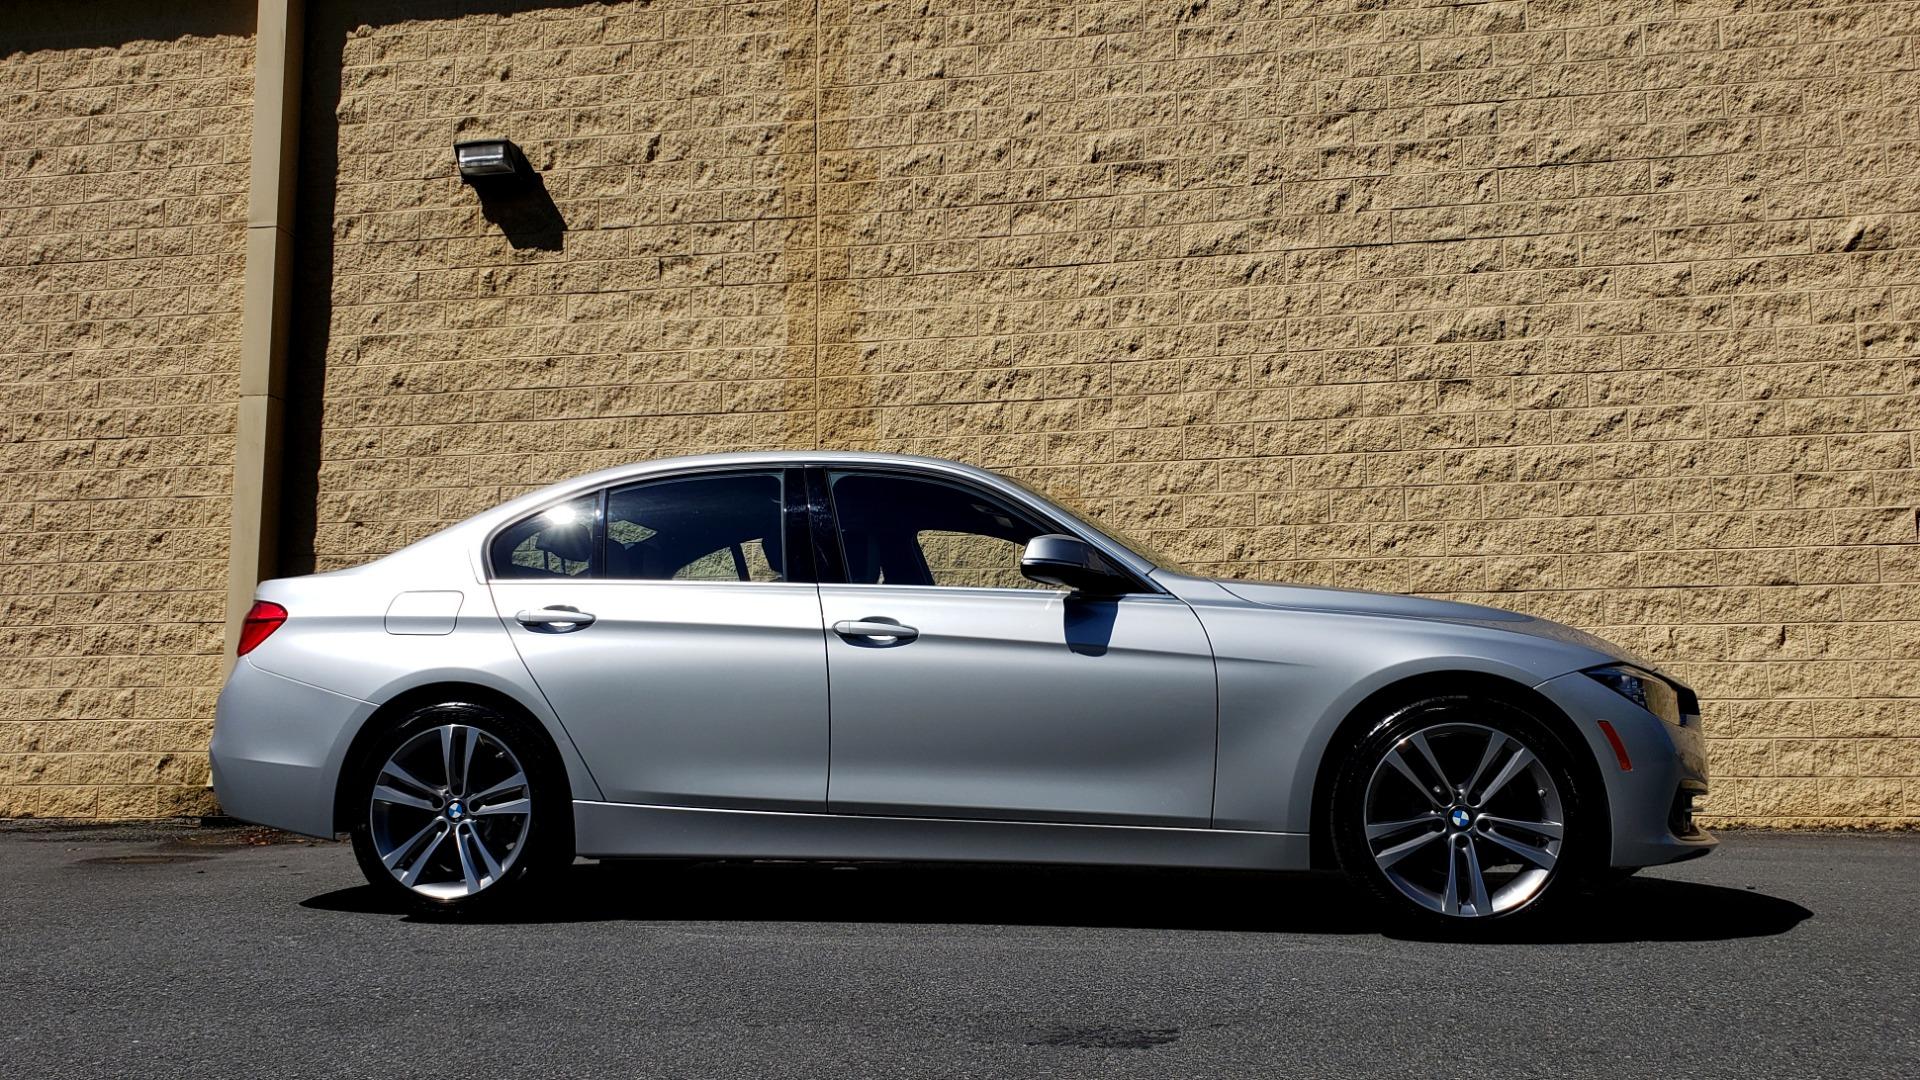 Used 2017 BMW 3 SERIES 330I SPORT SEDAN / DRVR ASST PKG / SUNROOF / REARVIEW for sale Sold at Formula Imports in Charlotte NC 28227 5